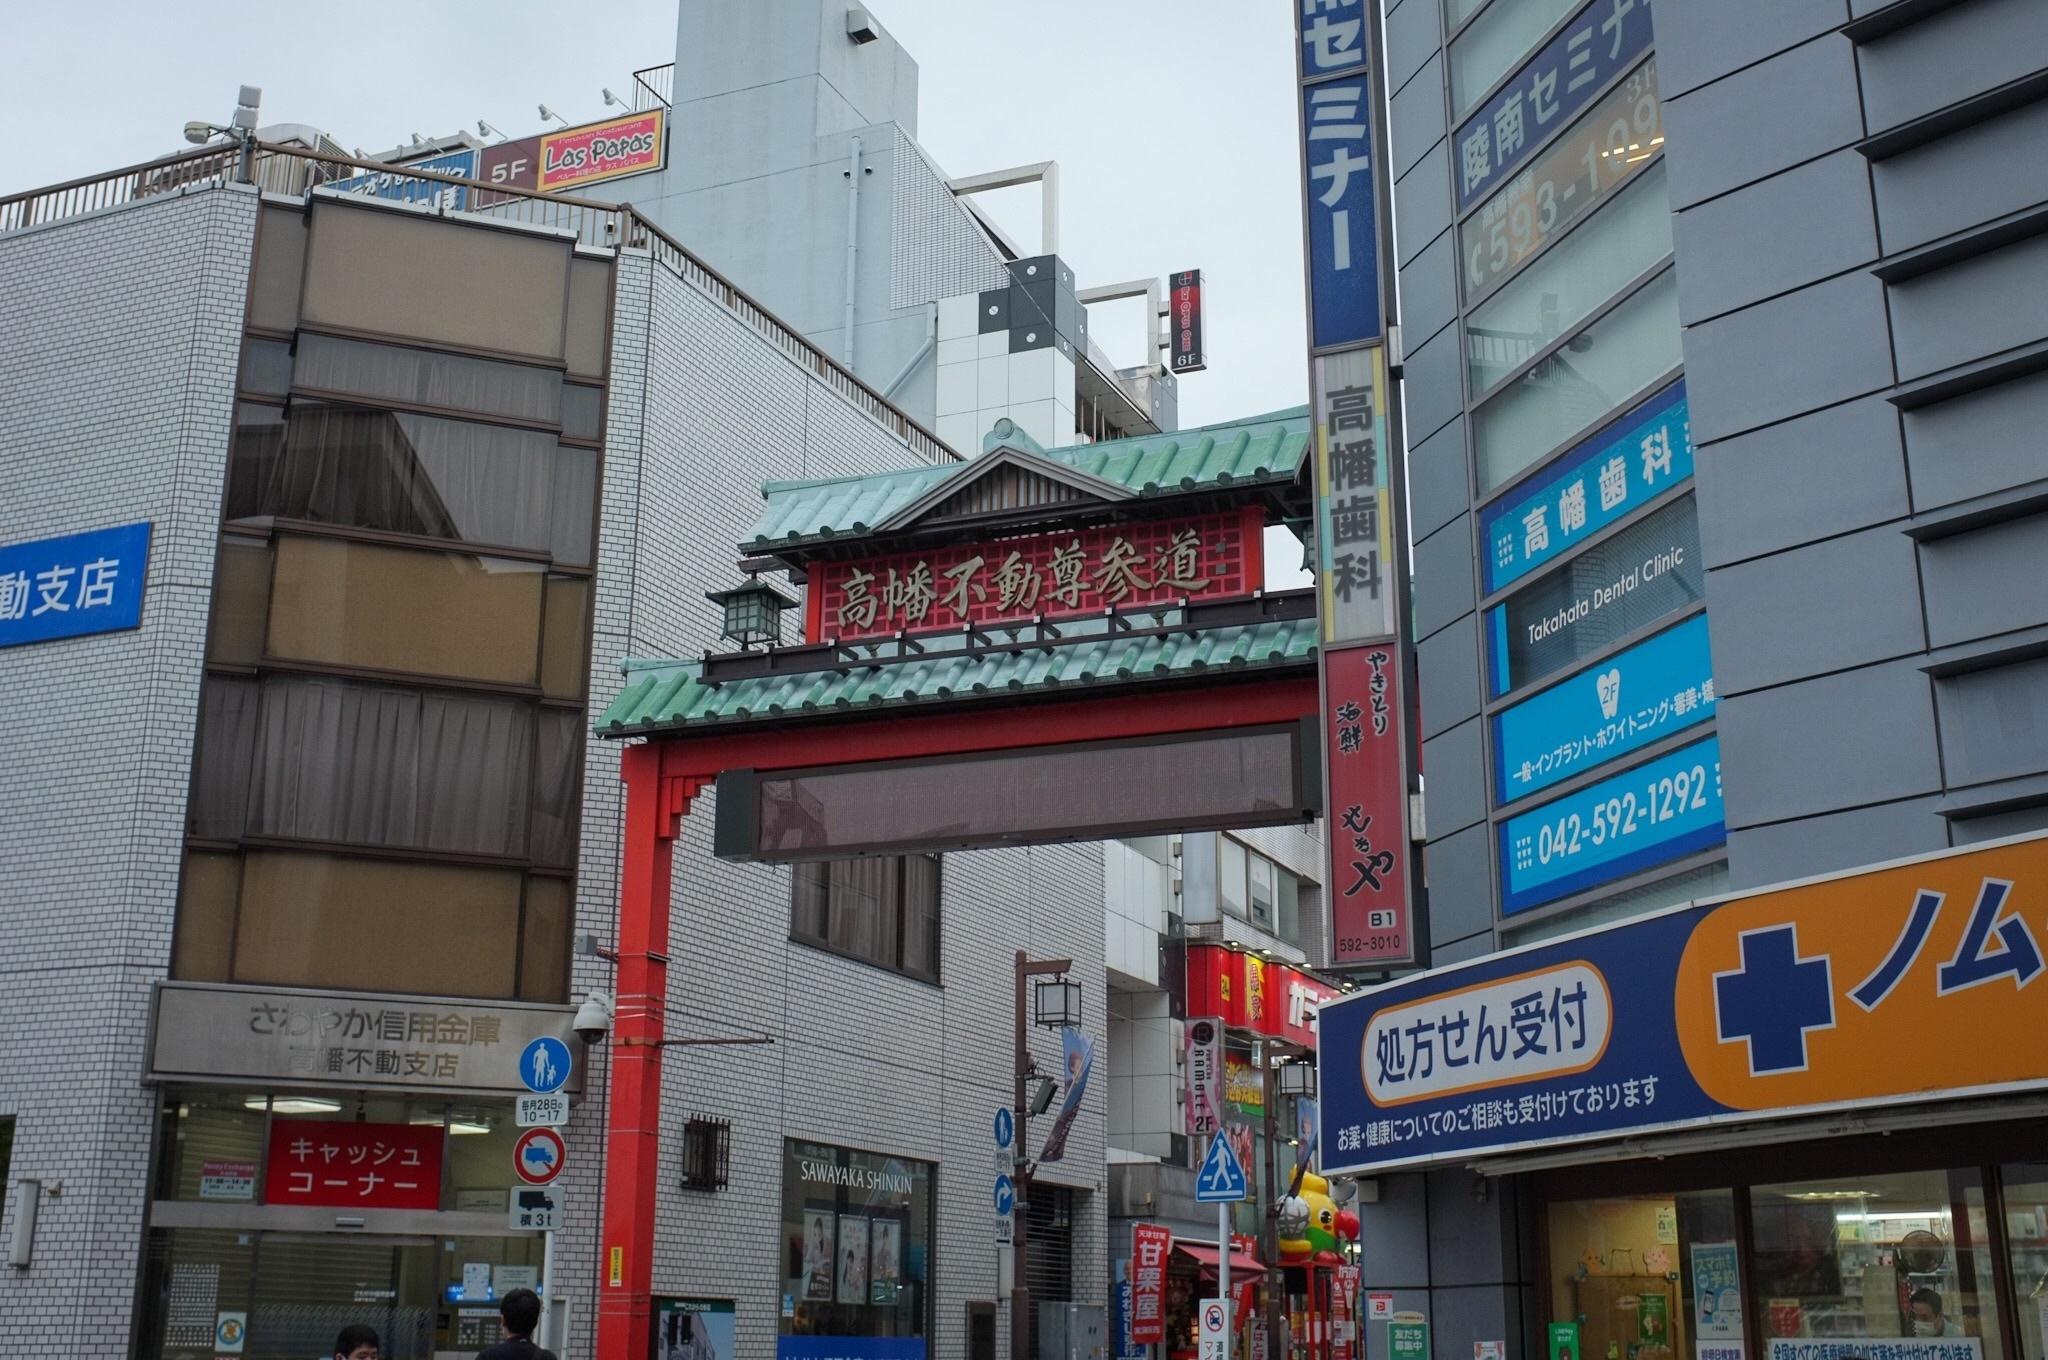 f:id:Yamadamado:20200914074329j:image